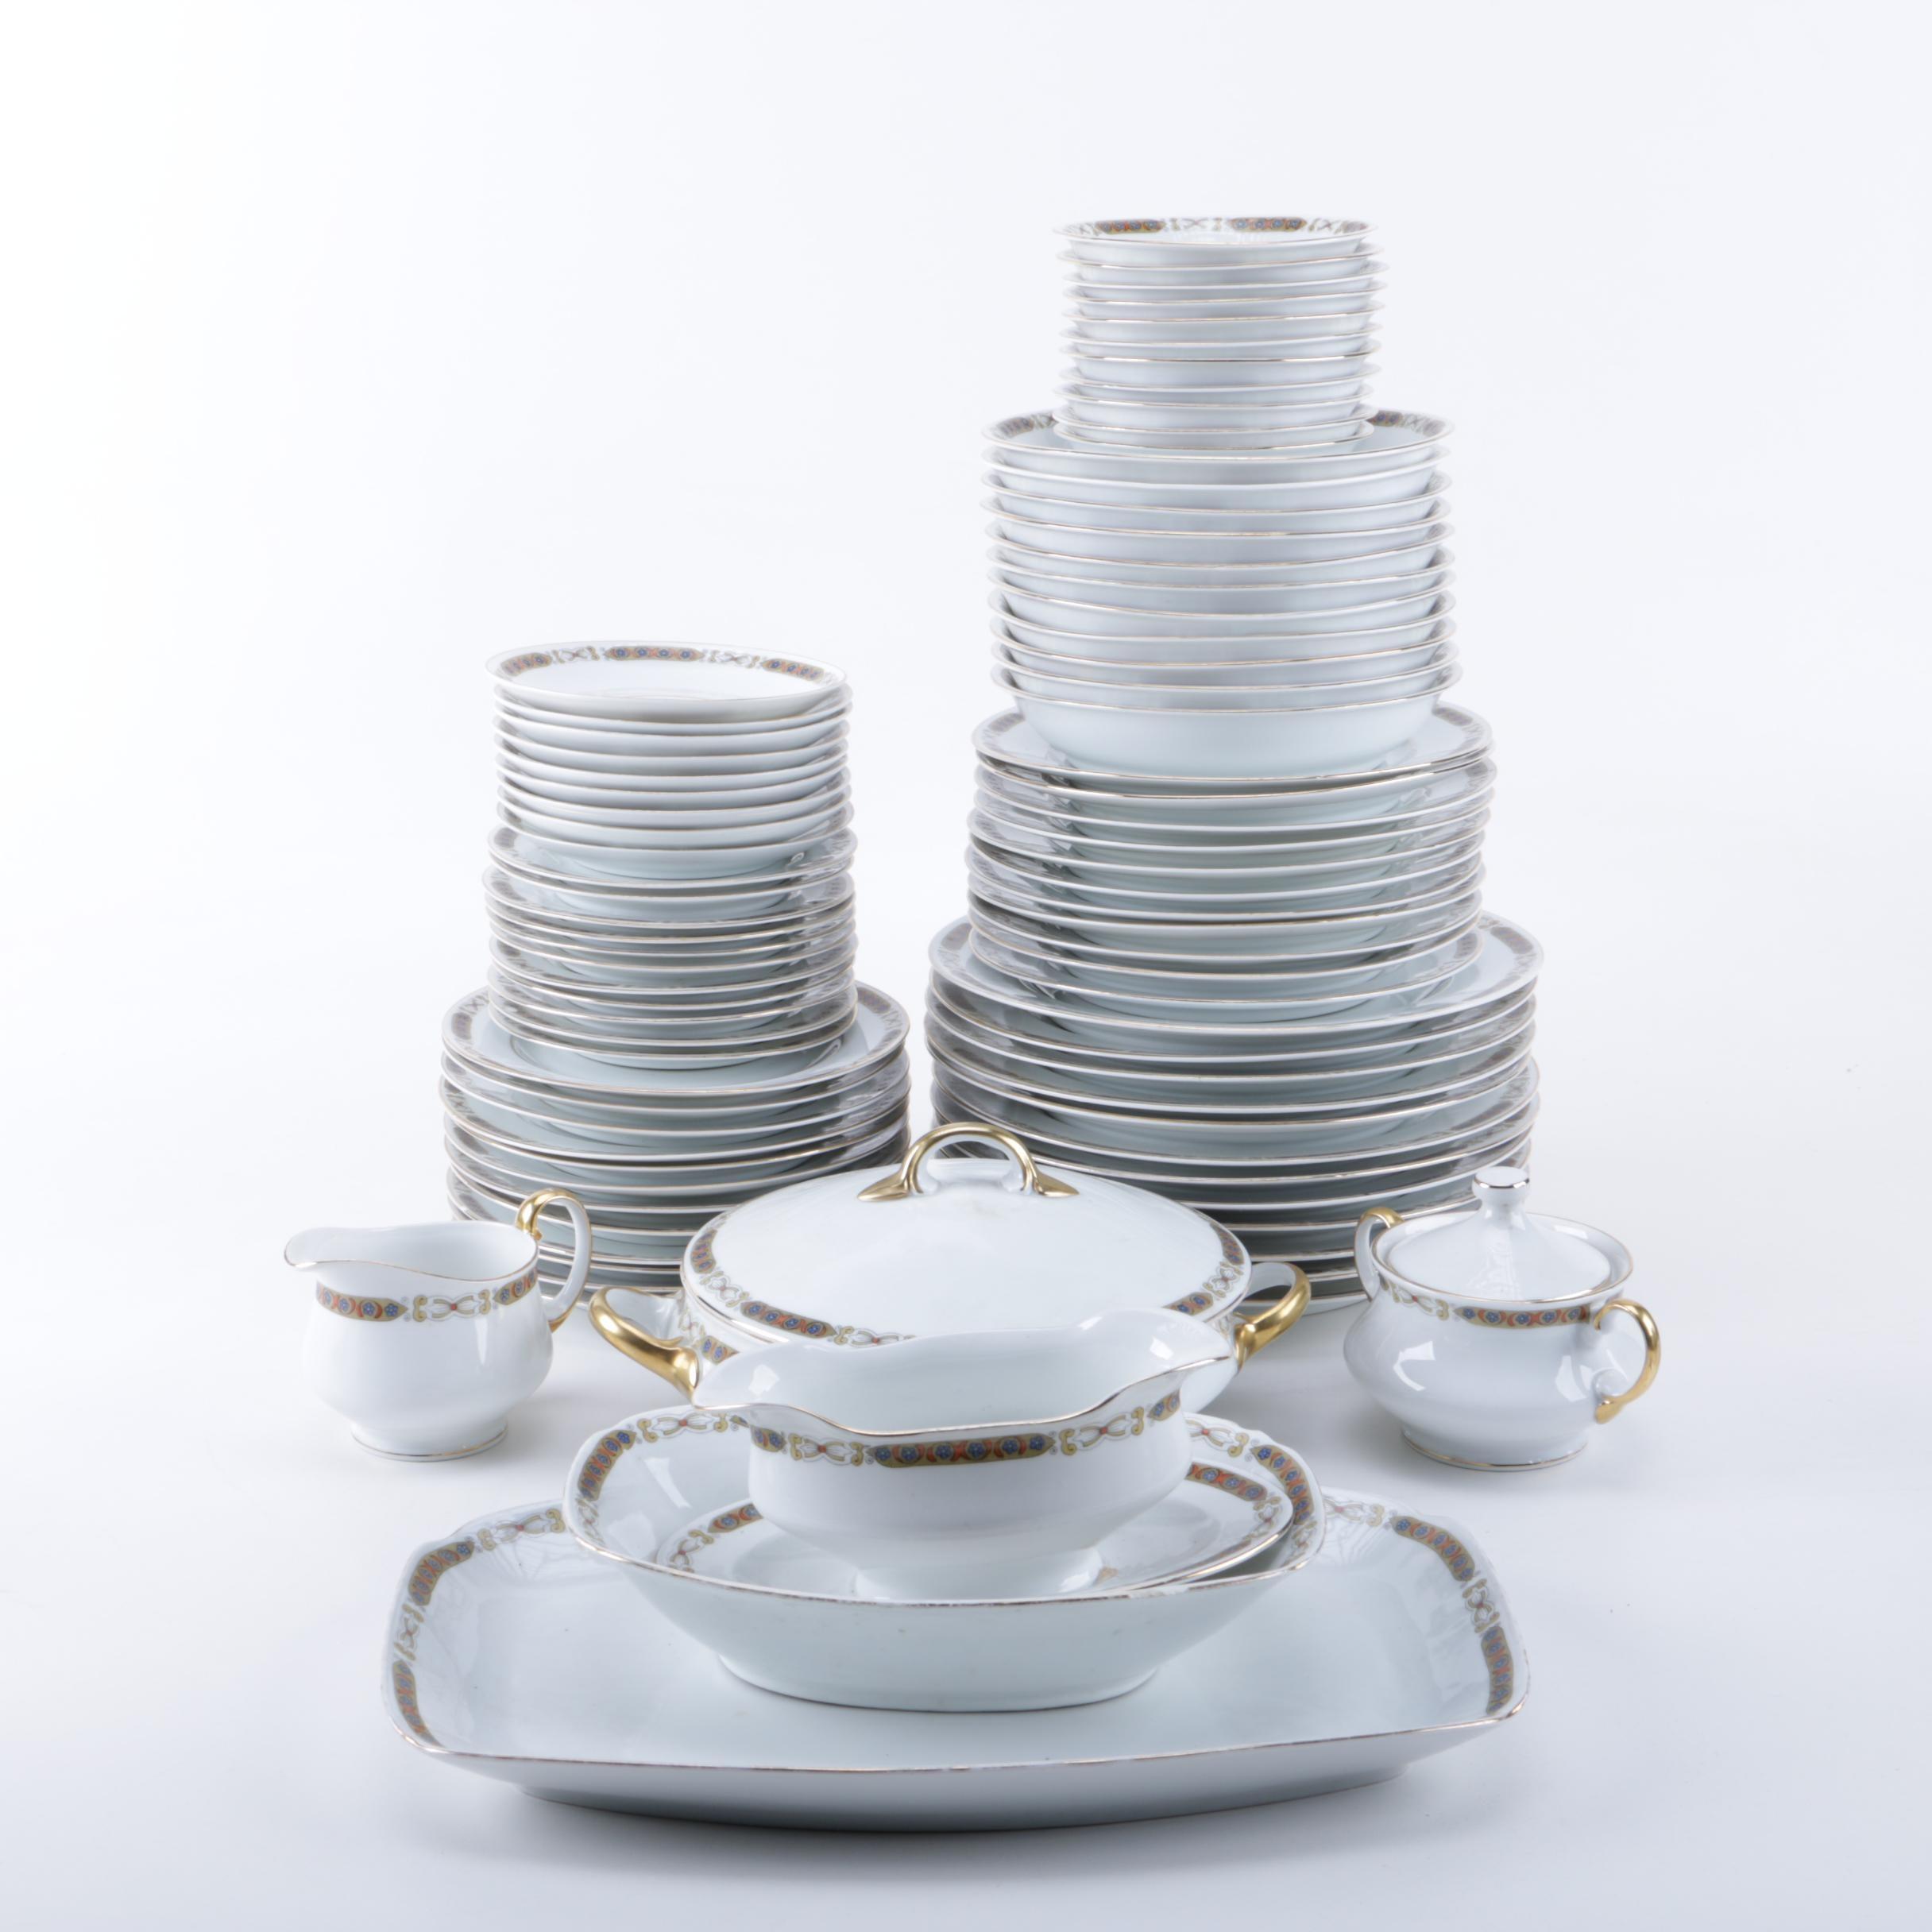 PRIORITY-Epiag Royal Czech Tableware ... & PRIORITY-Epiag Royal Czech Tableware : EBTH